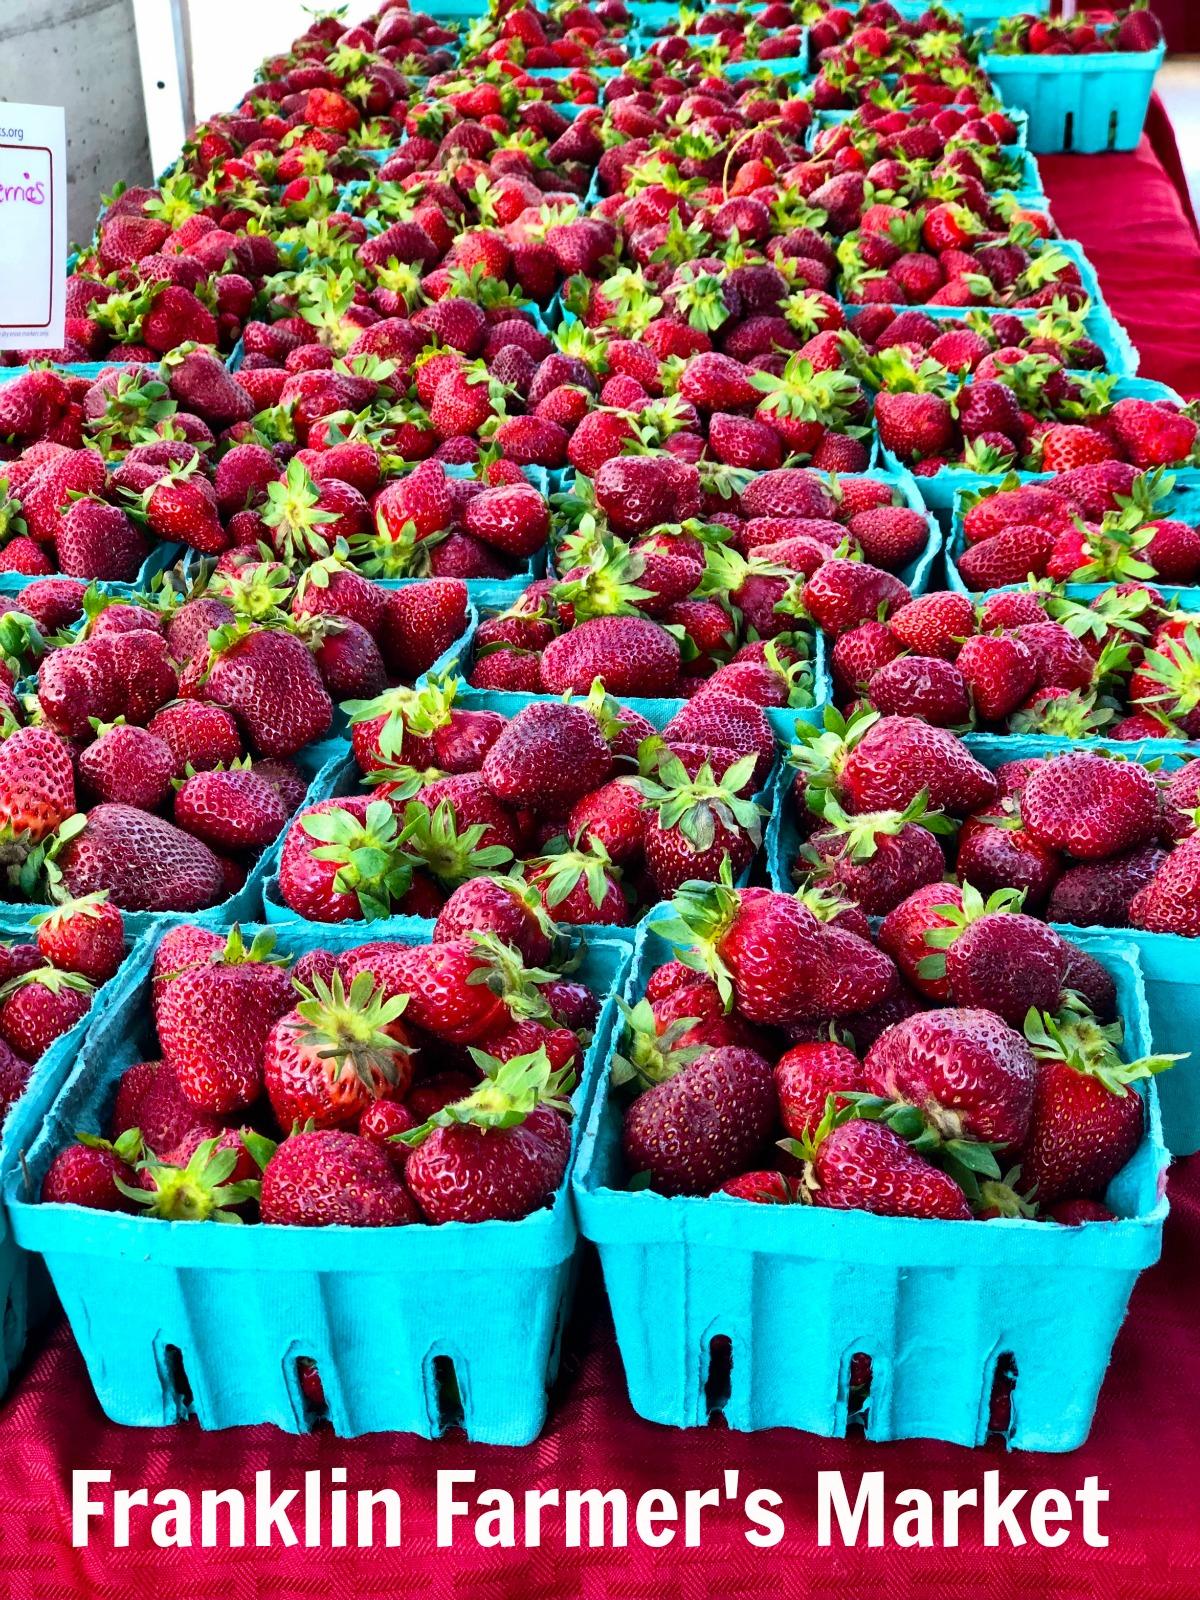 Franklin Farmer's Market Strawberries #franklin #strawberries